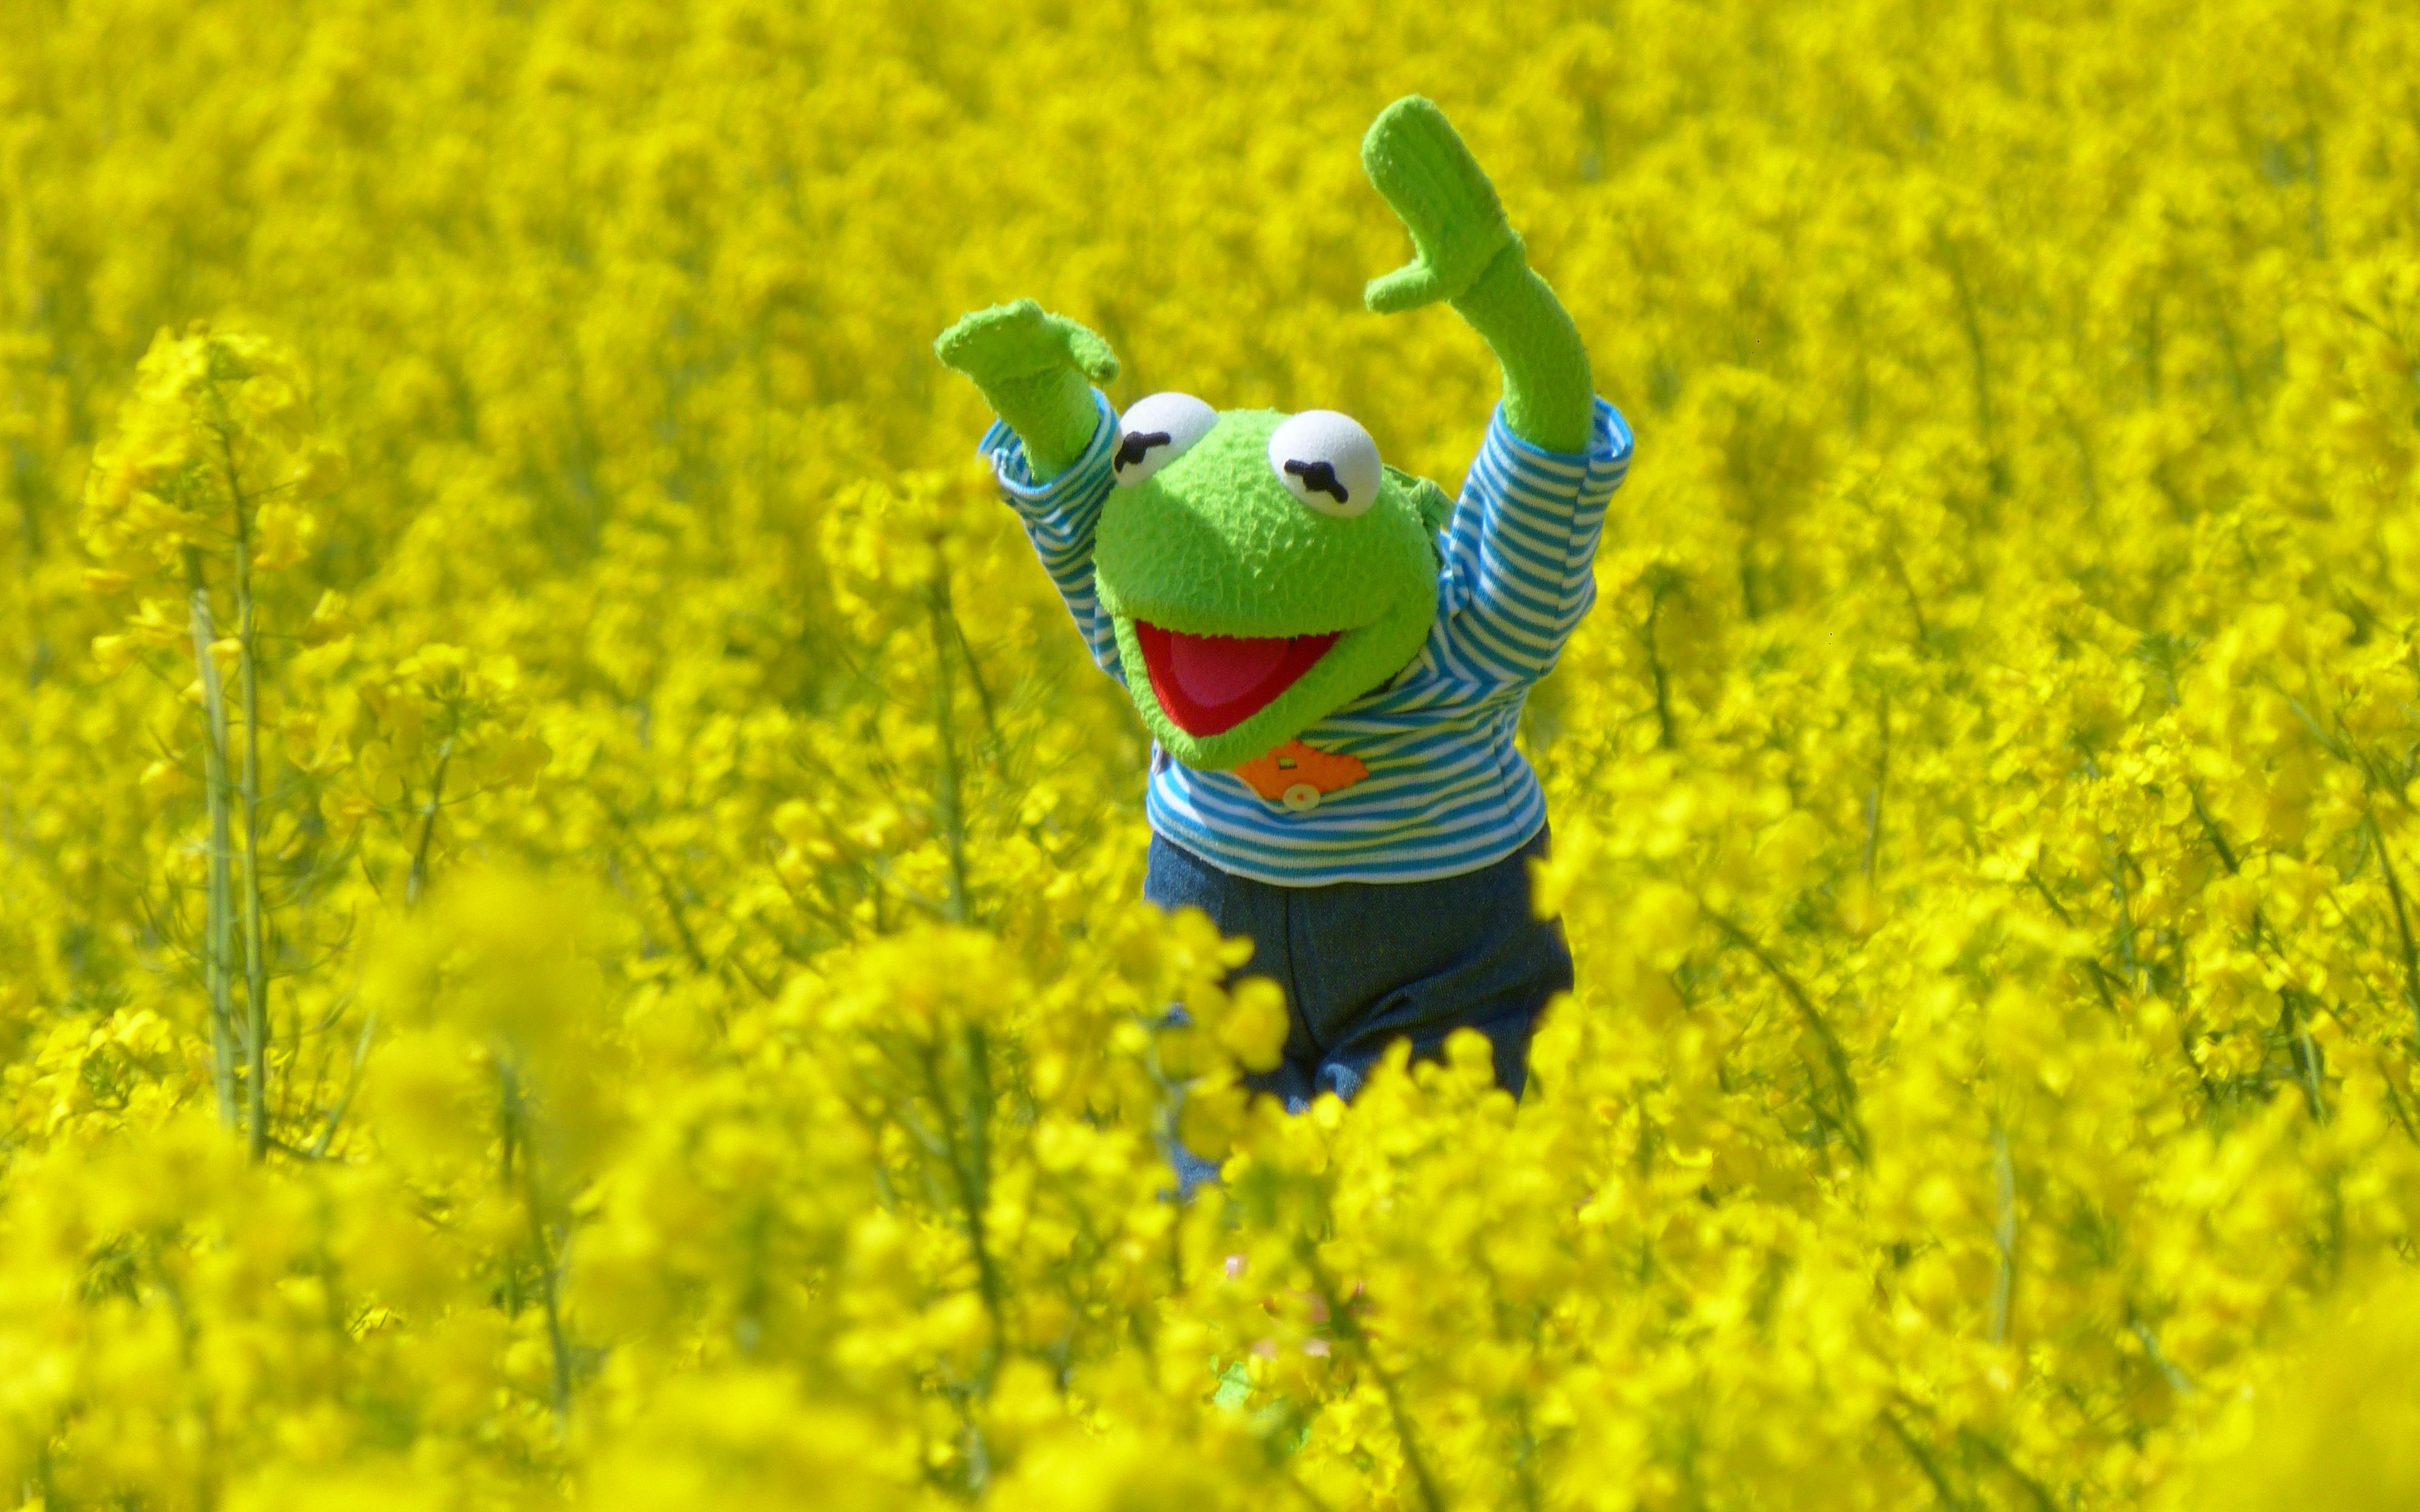 Wallpaper Kermit The Frog Blossoms 4000x2500 Orionsdb